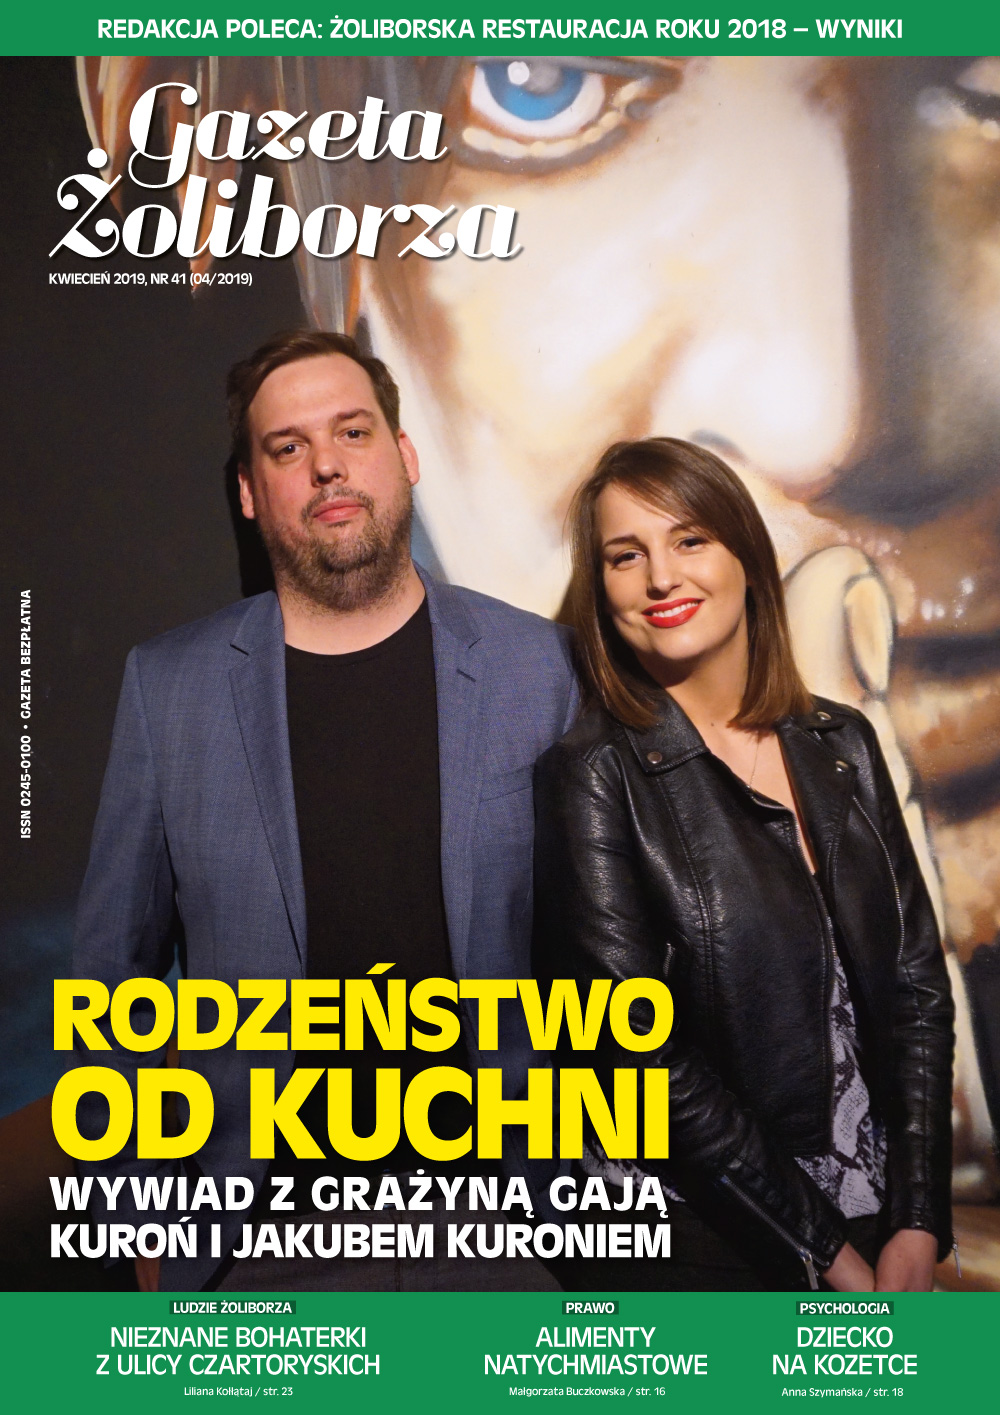 Gazeta Żoliborza - 04/2019 (41)